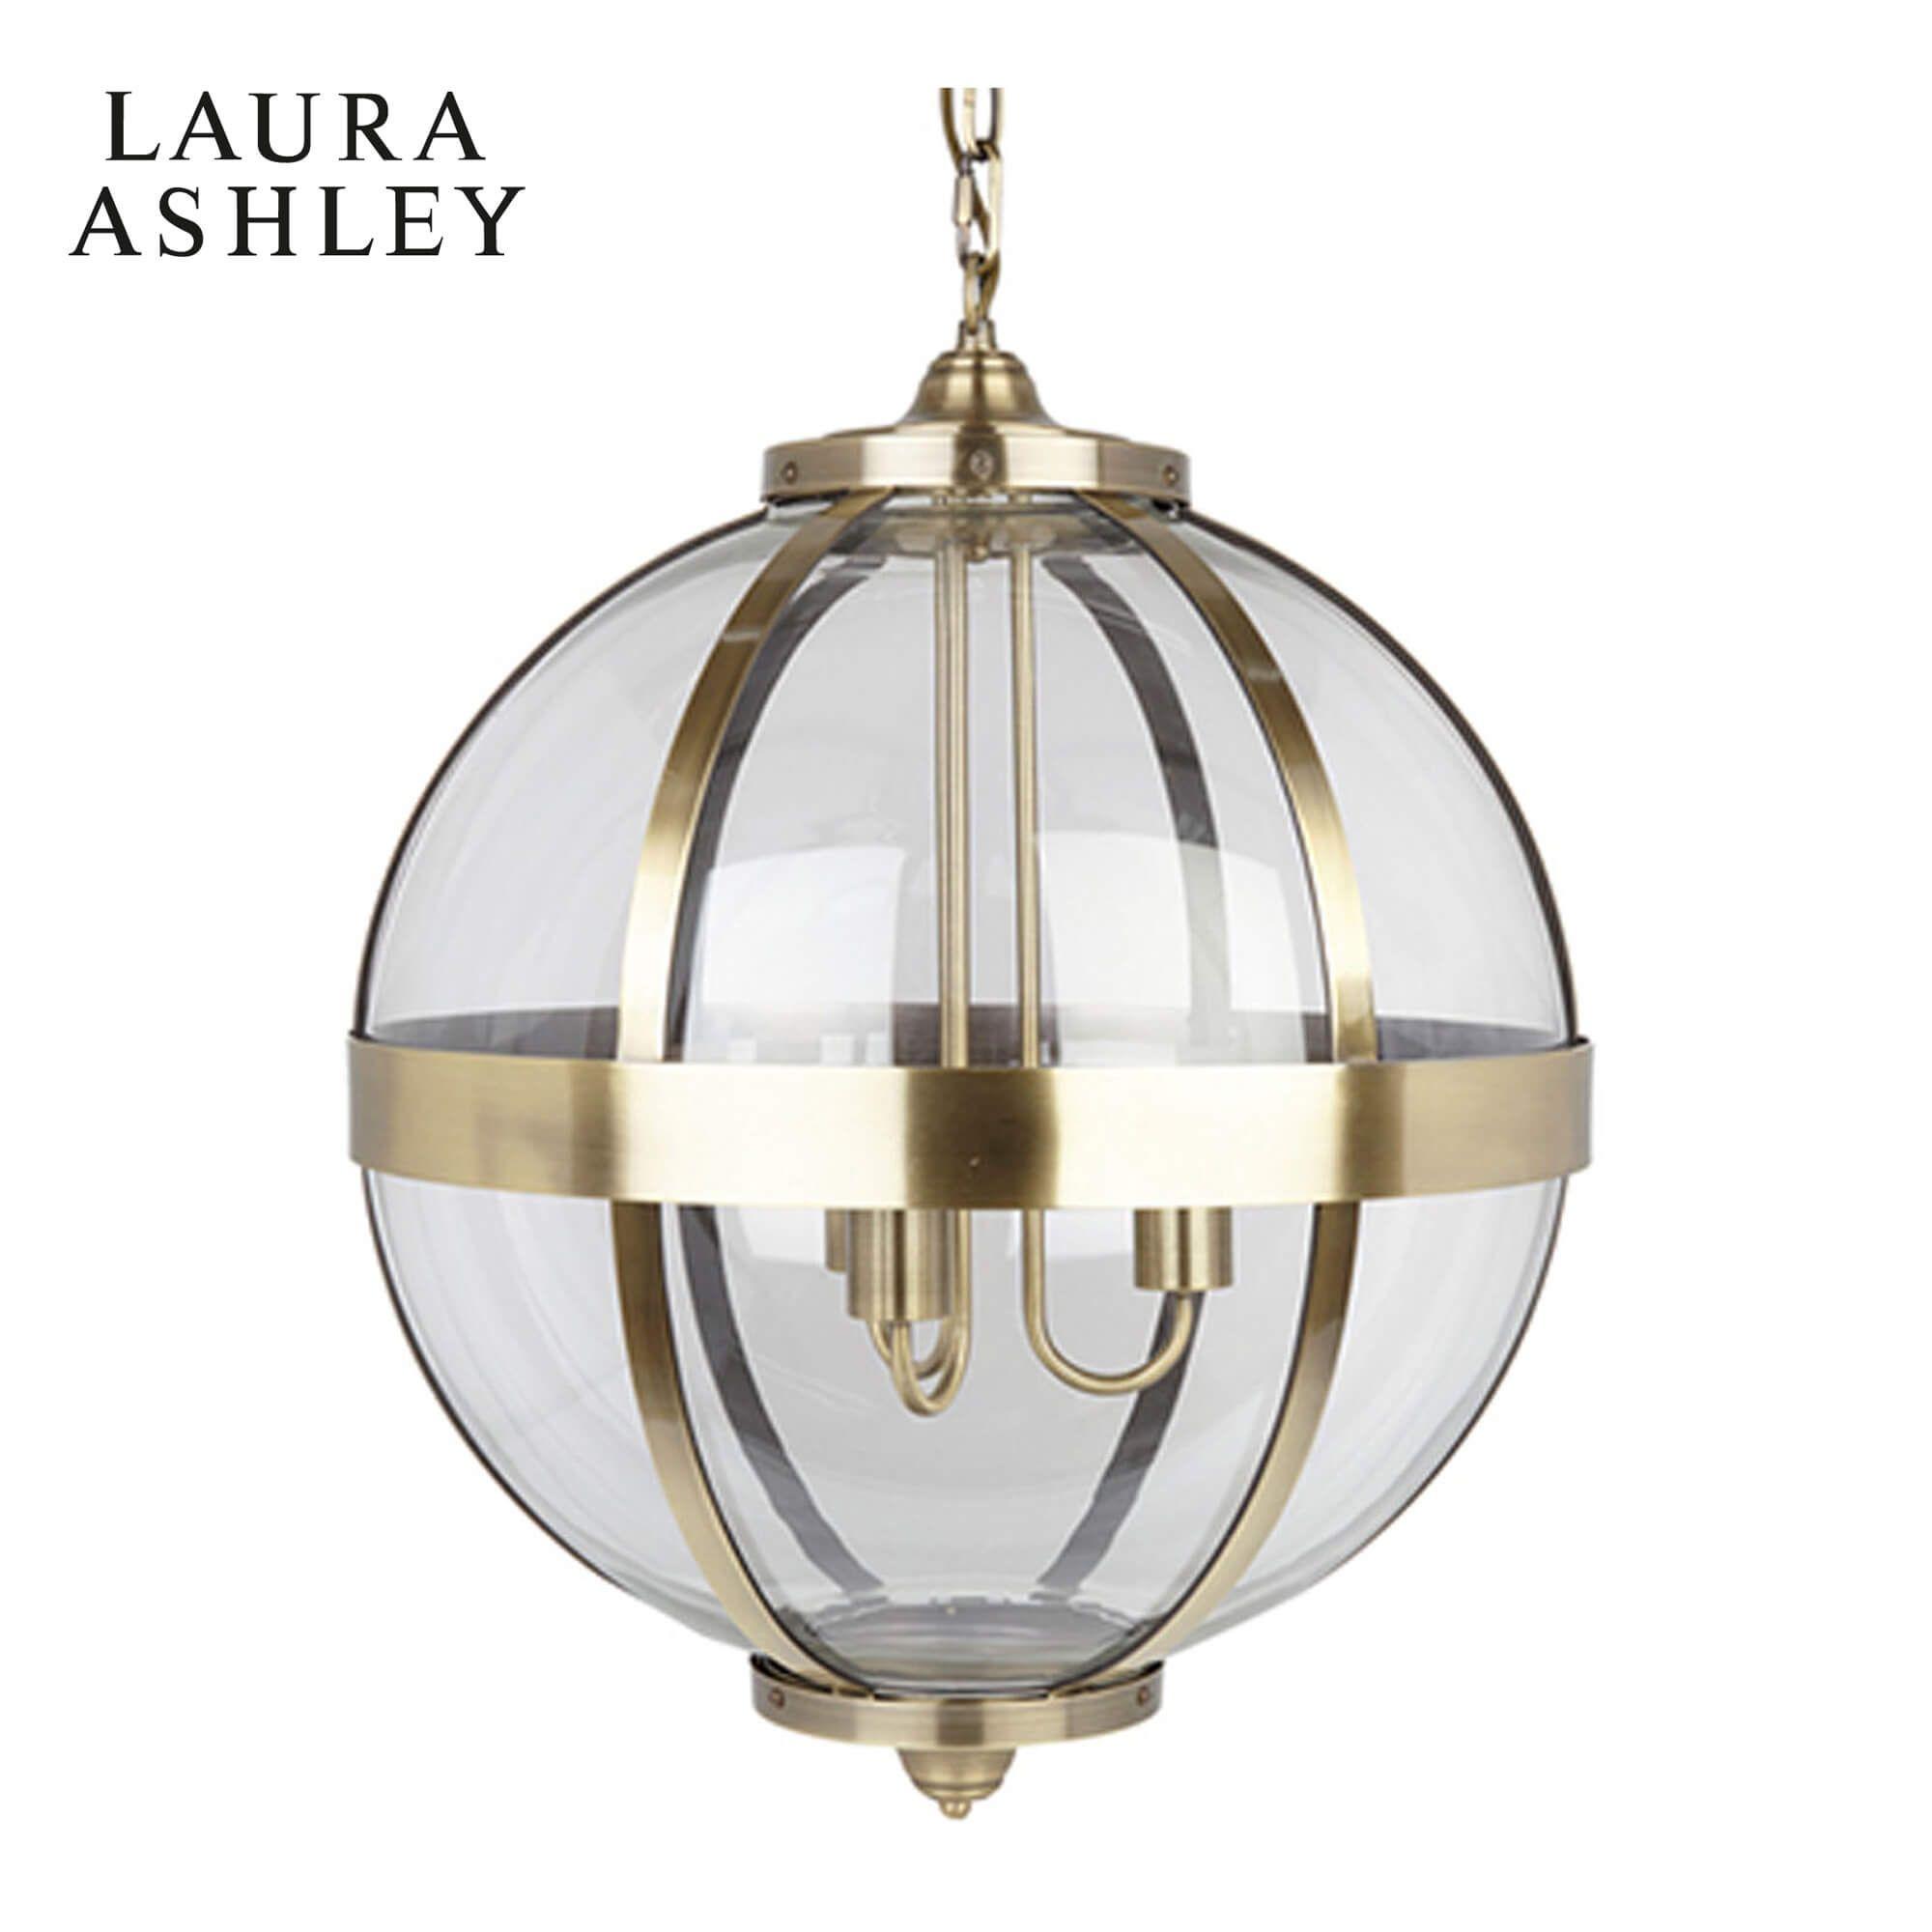 Picture of: Laura Ashley Odiham Globe Lantern Antique Brass Glass